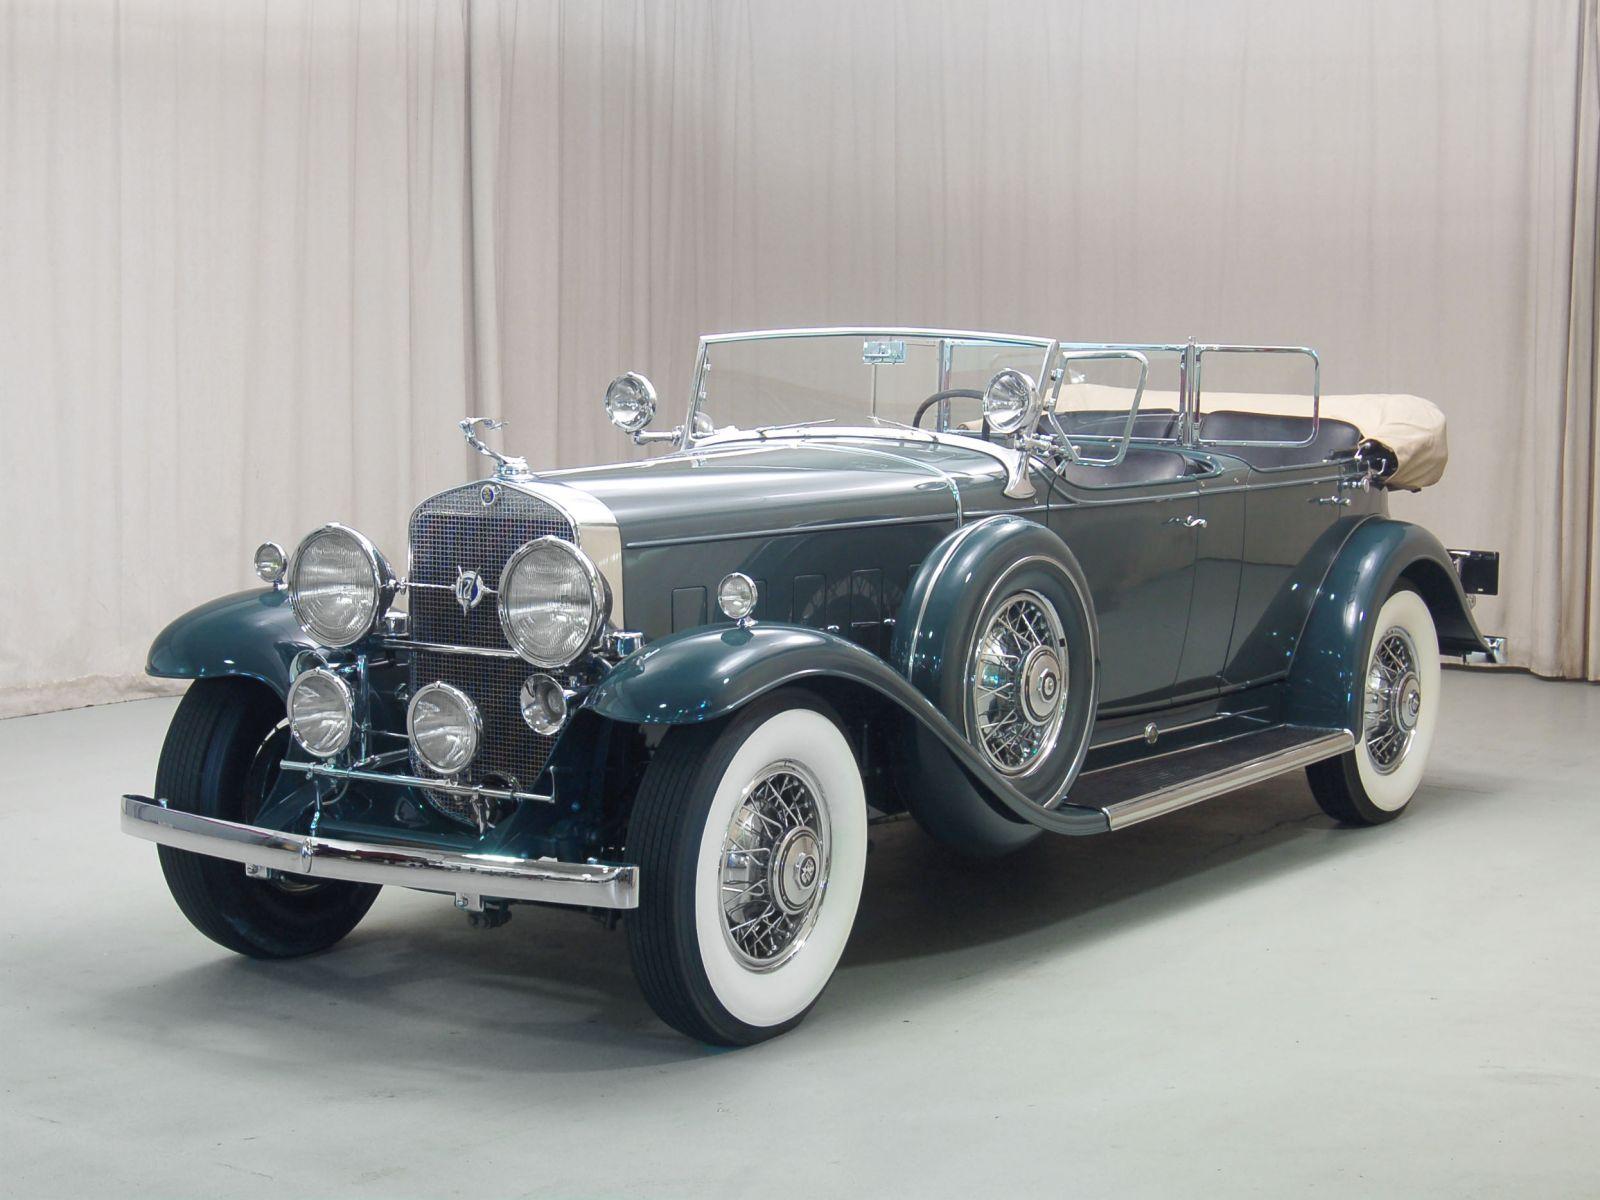 1931 cadillac 370 a v12 hyman ltd classic cars. Black Bedroom Furniture Sets. Home Design Ideas